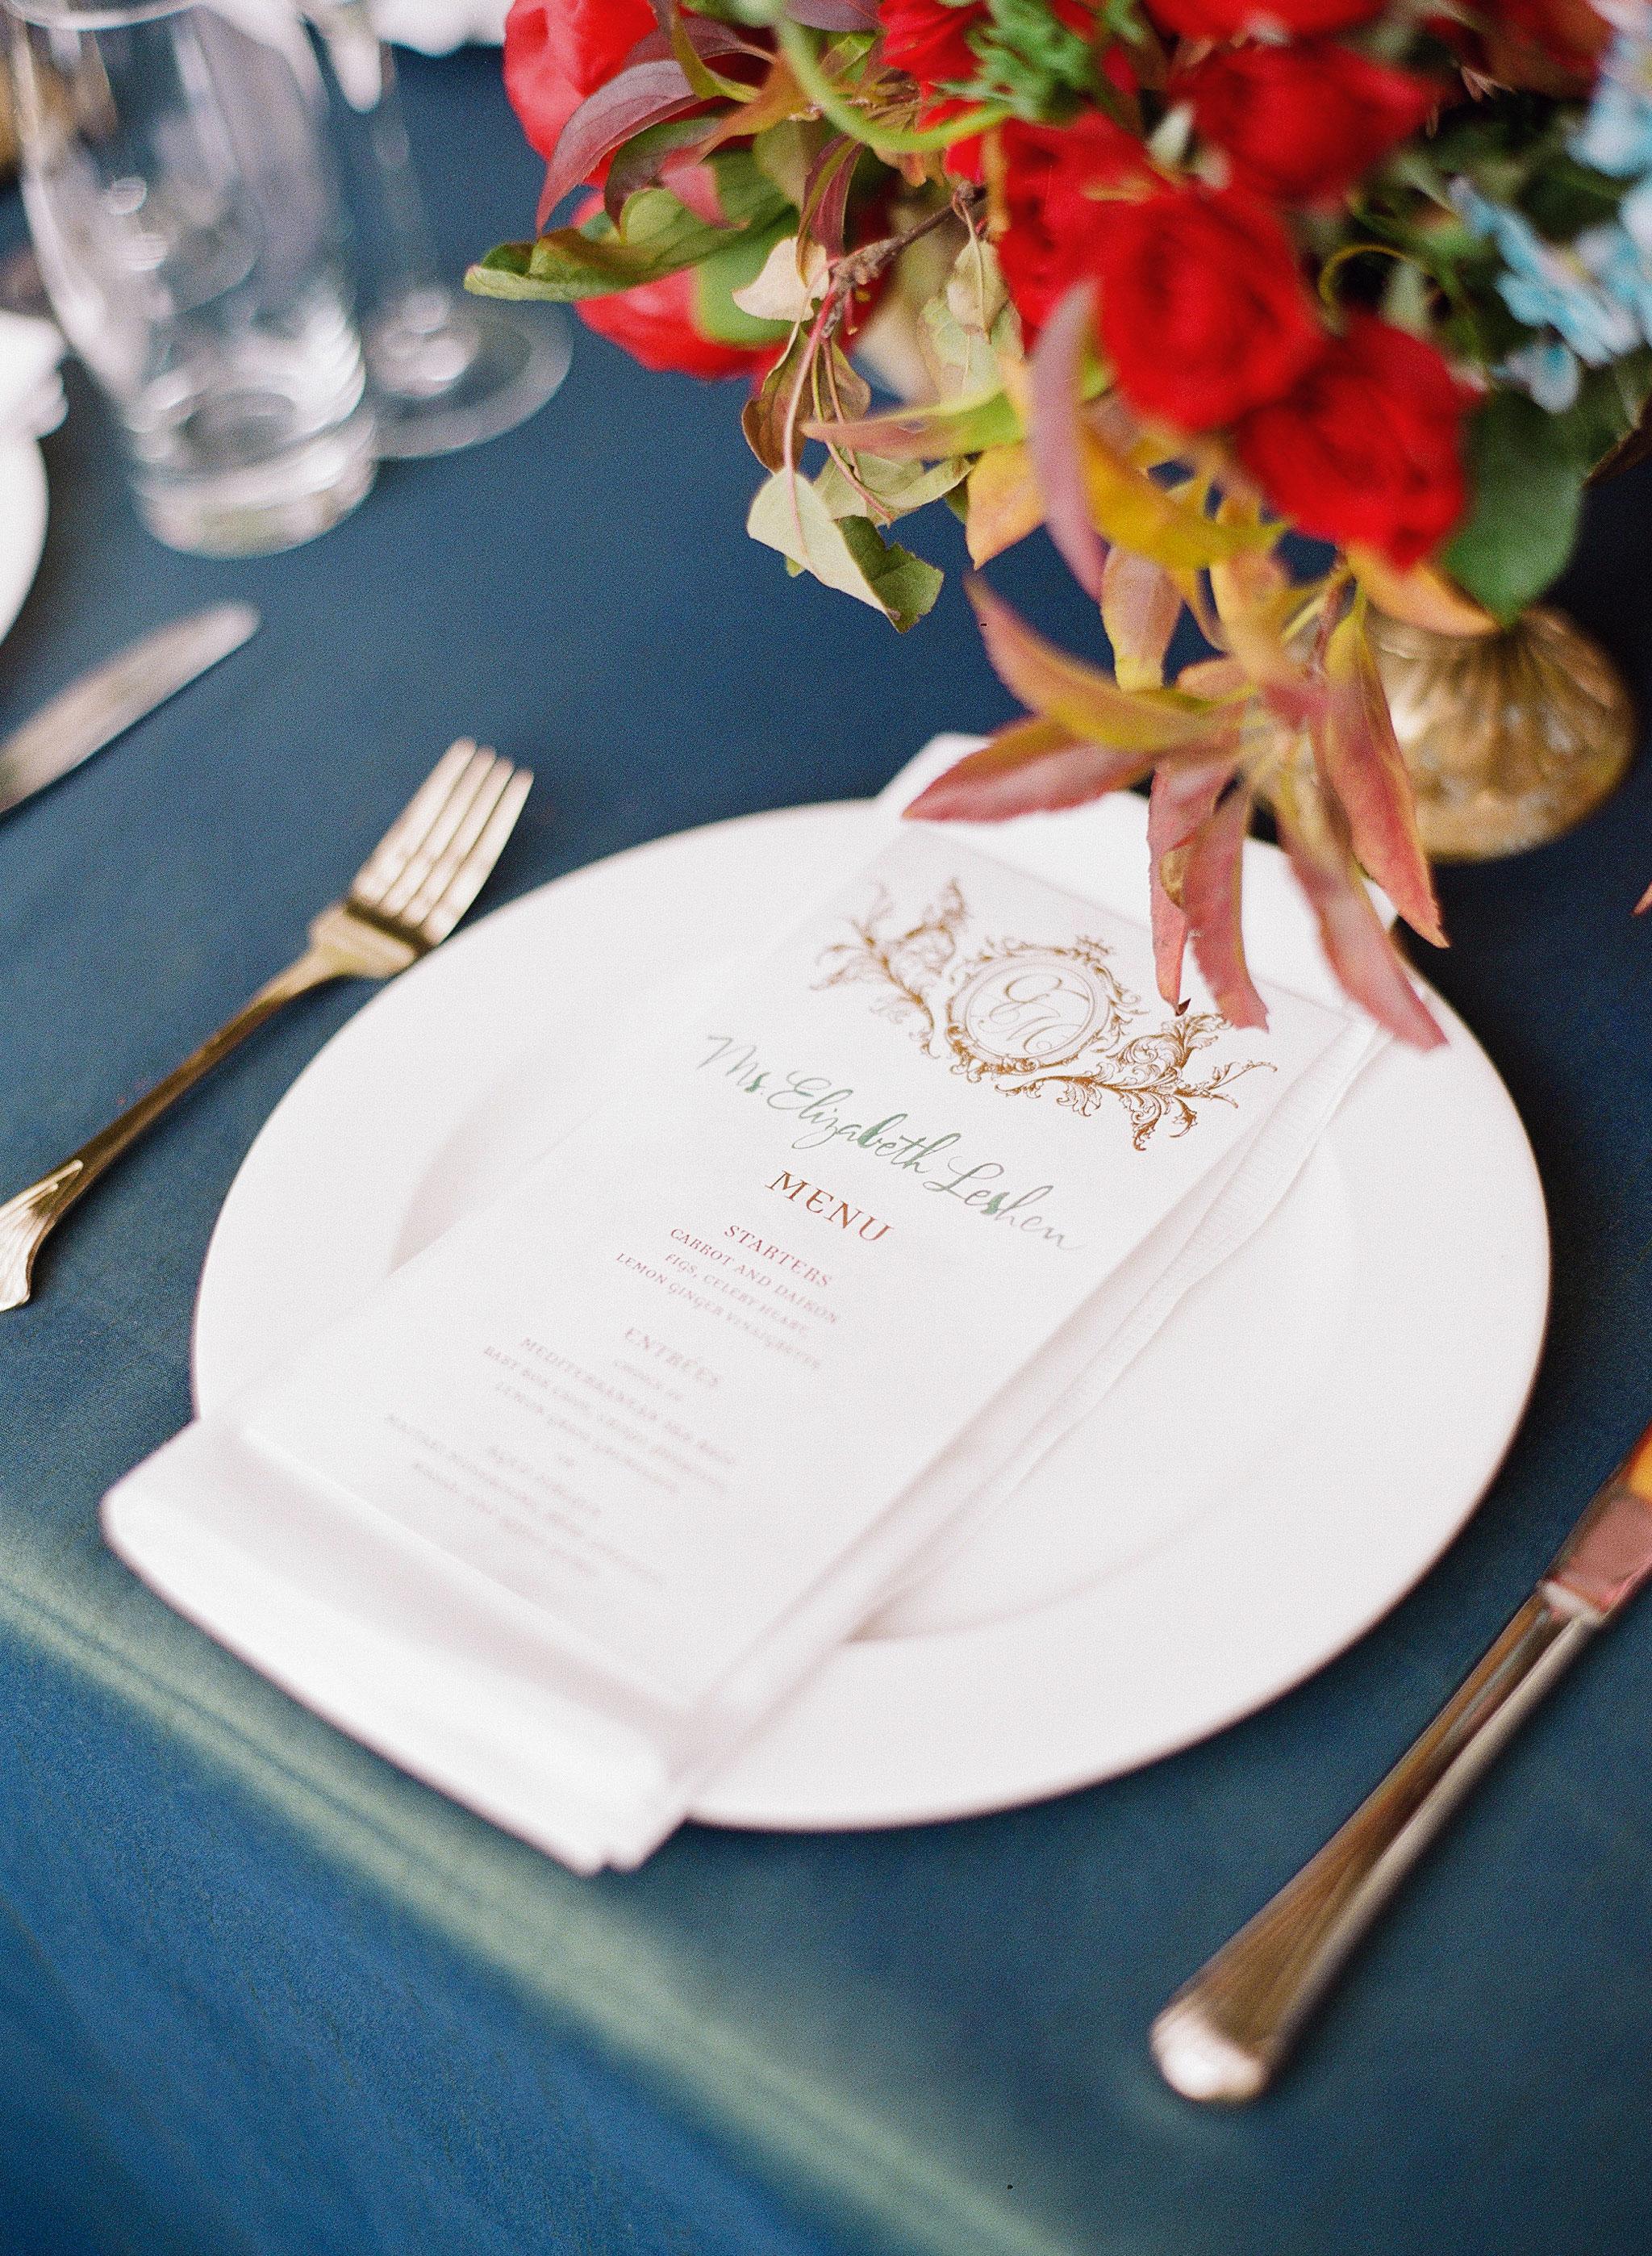 glara matthew wedding placesetting